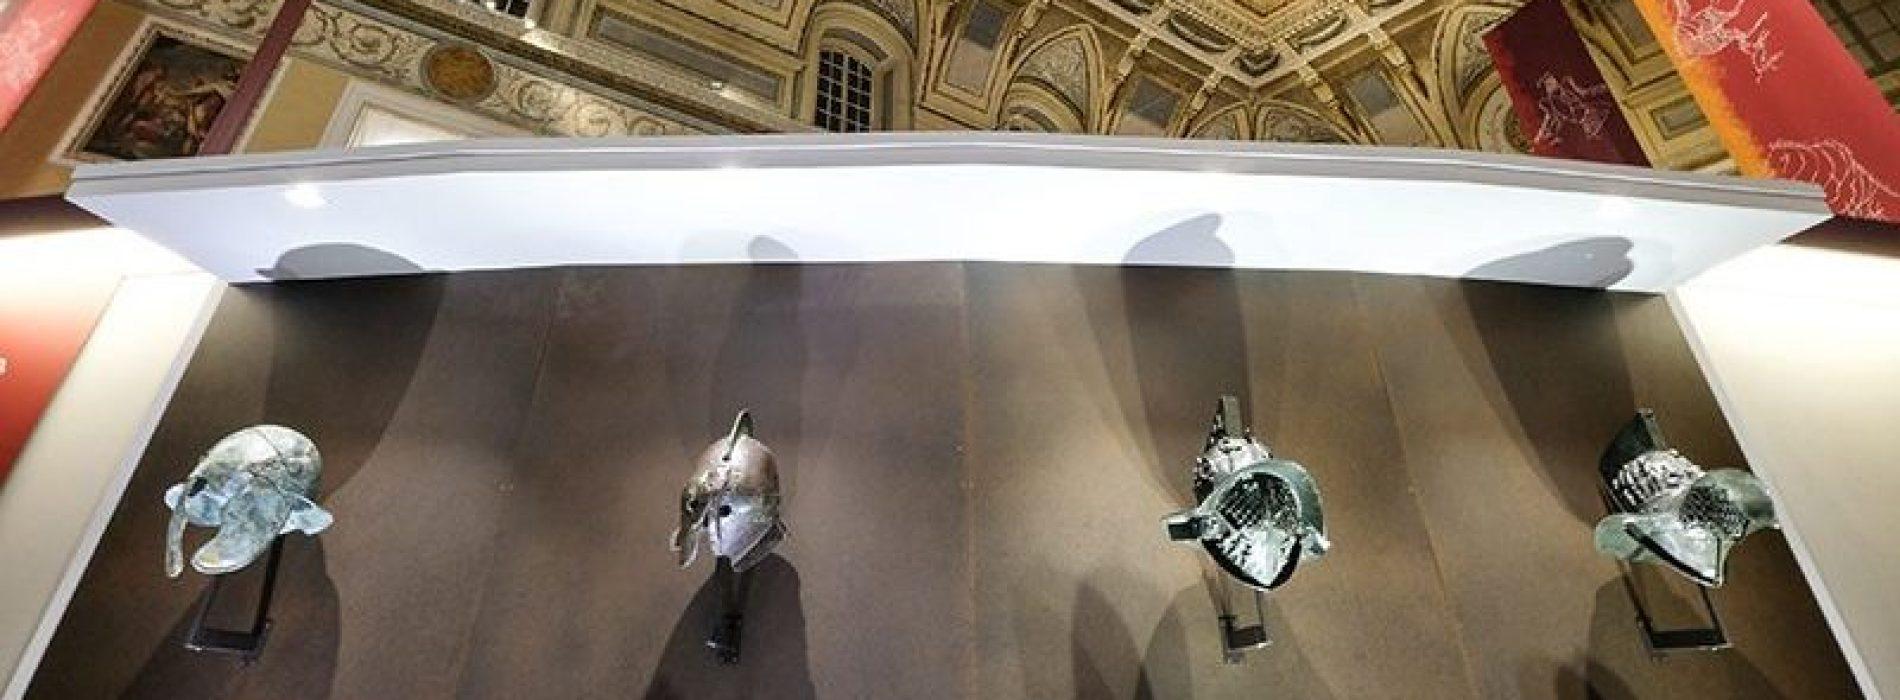 Napoli incontra l'archeologia, al via i giovedì culturali al Mann